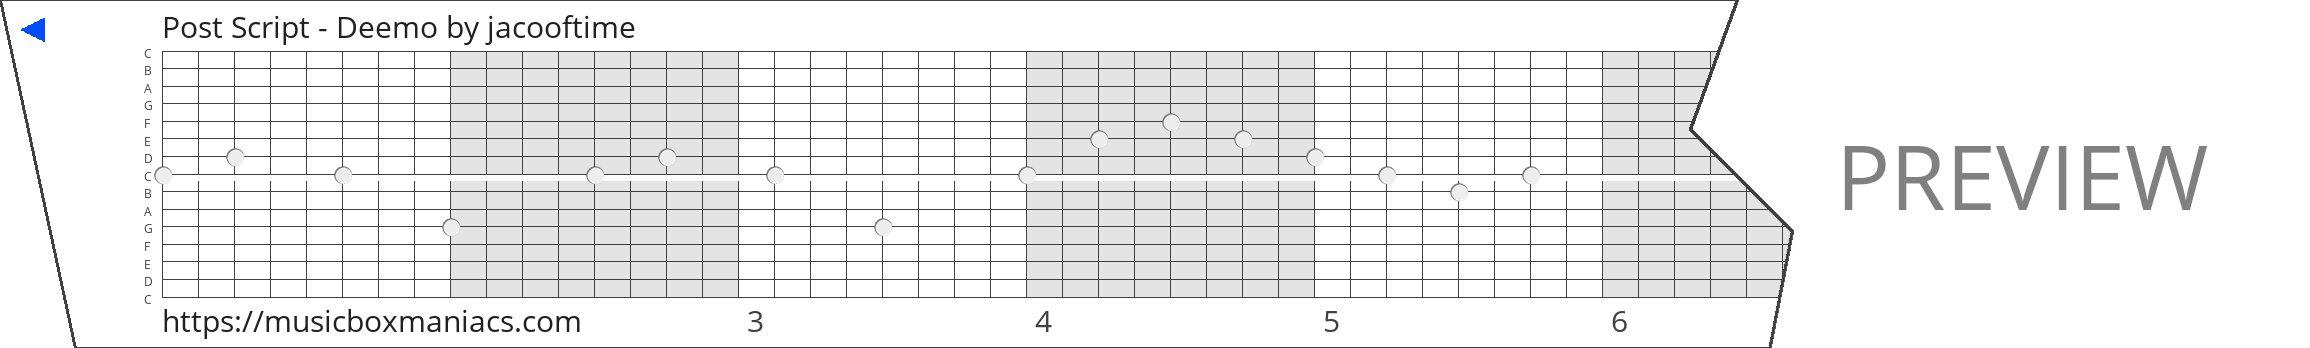 Post Script - Deemo 15 note music box paper strip